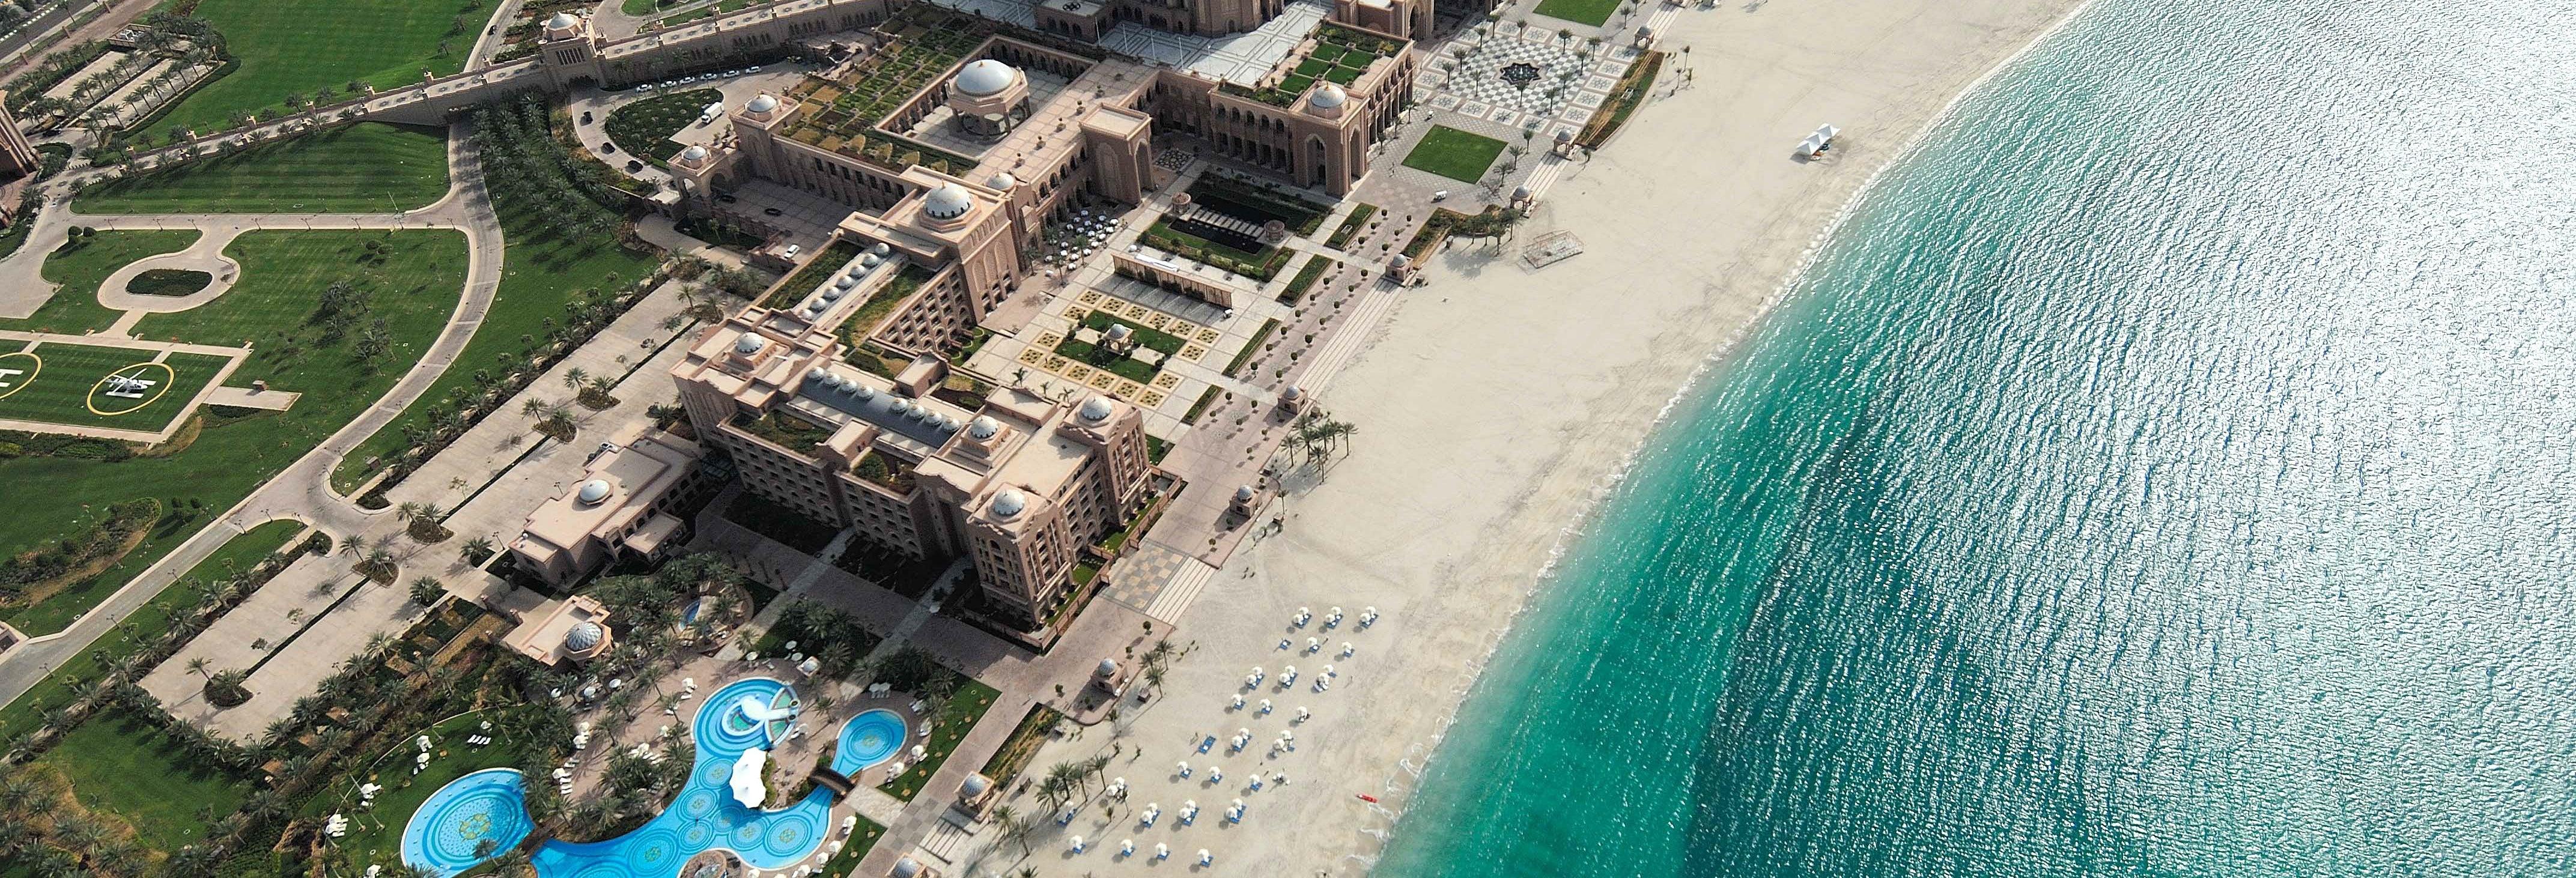 Excursion à Abou Dabi